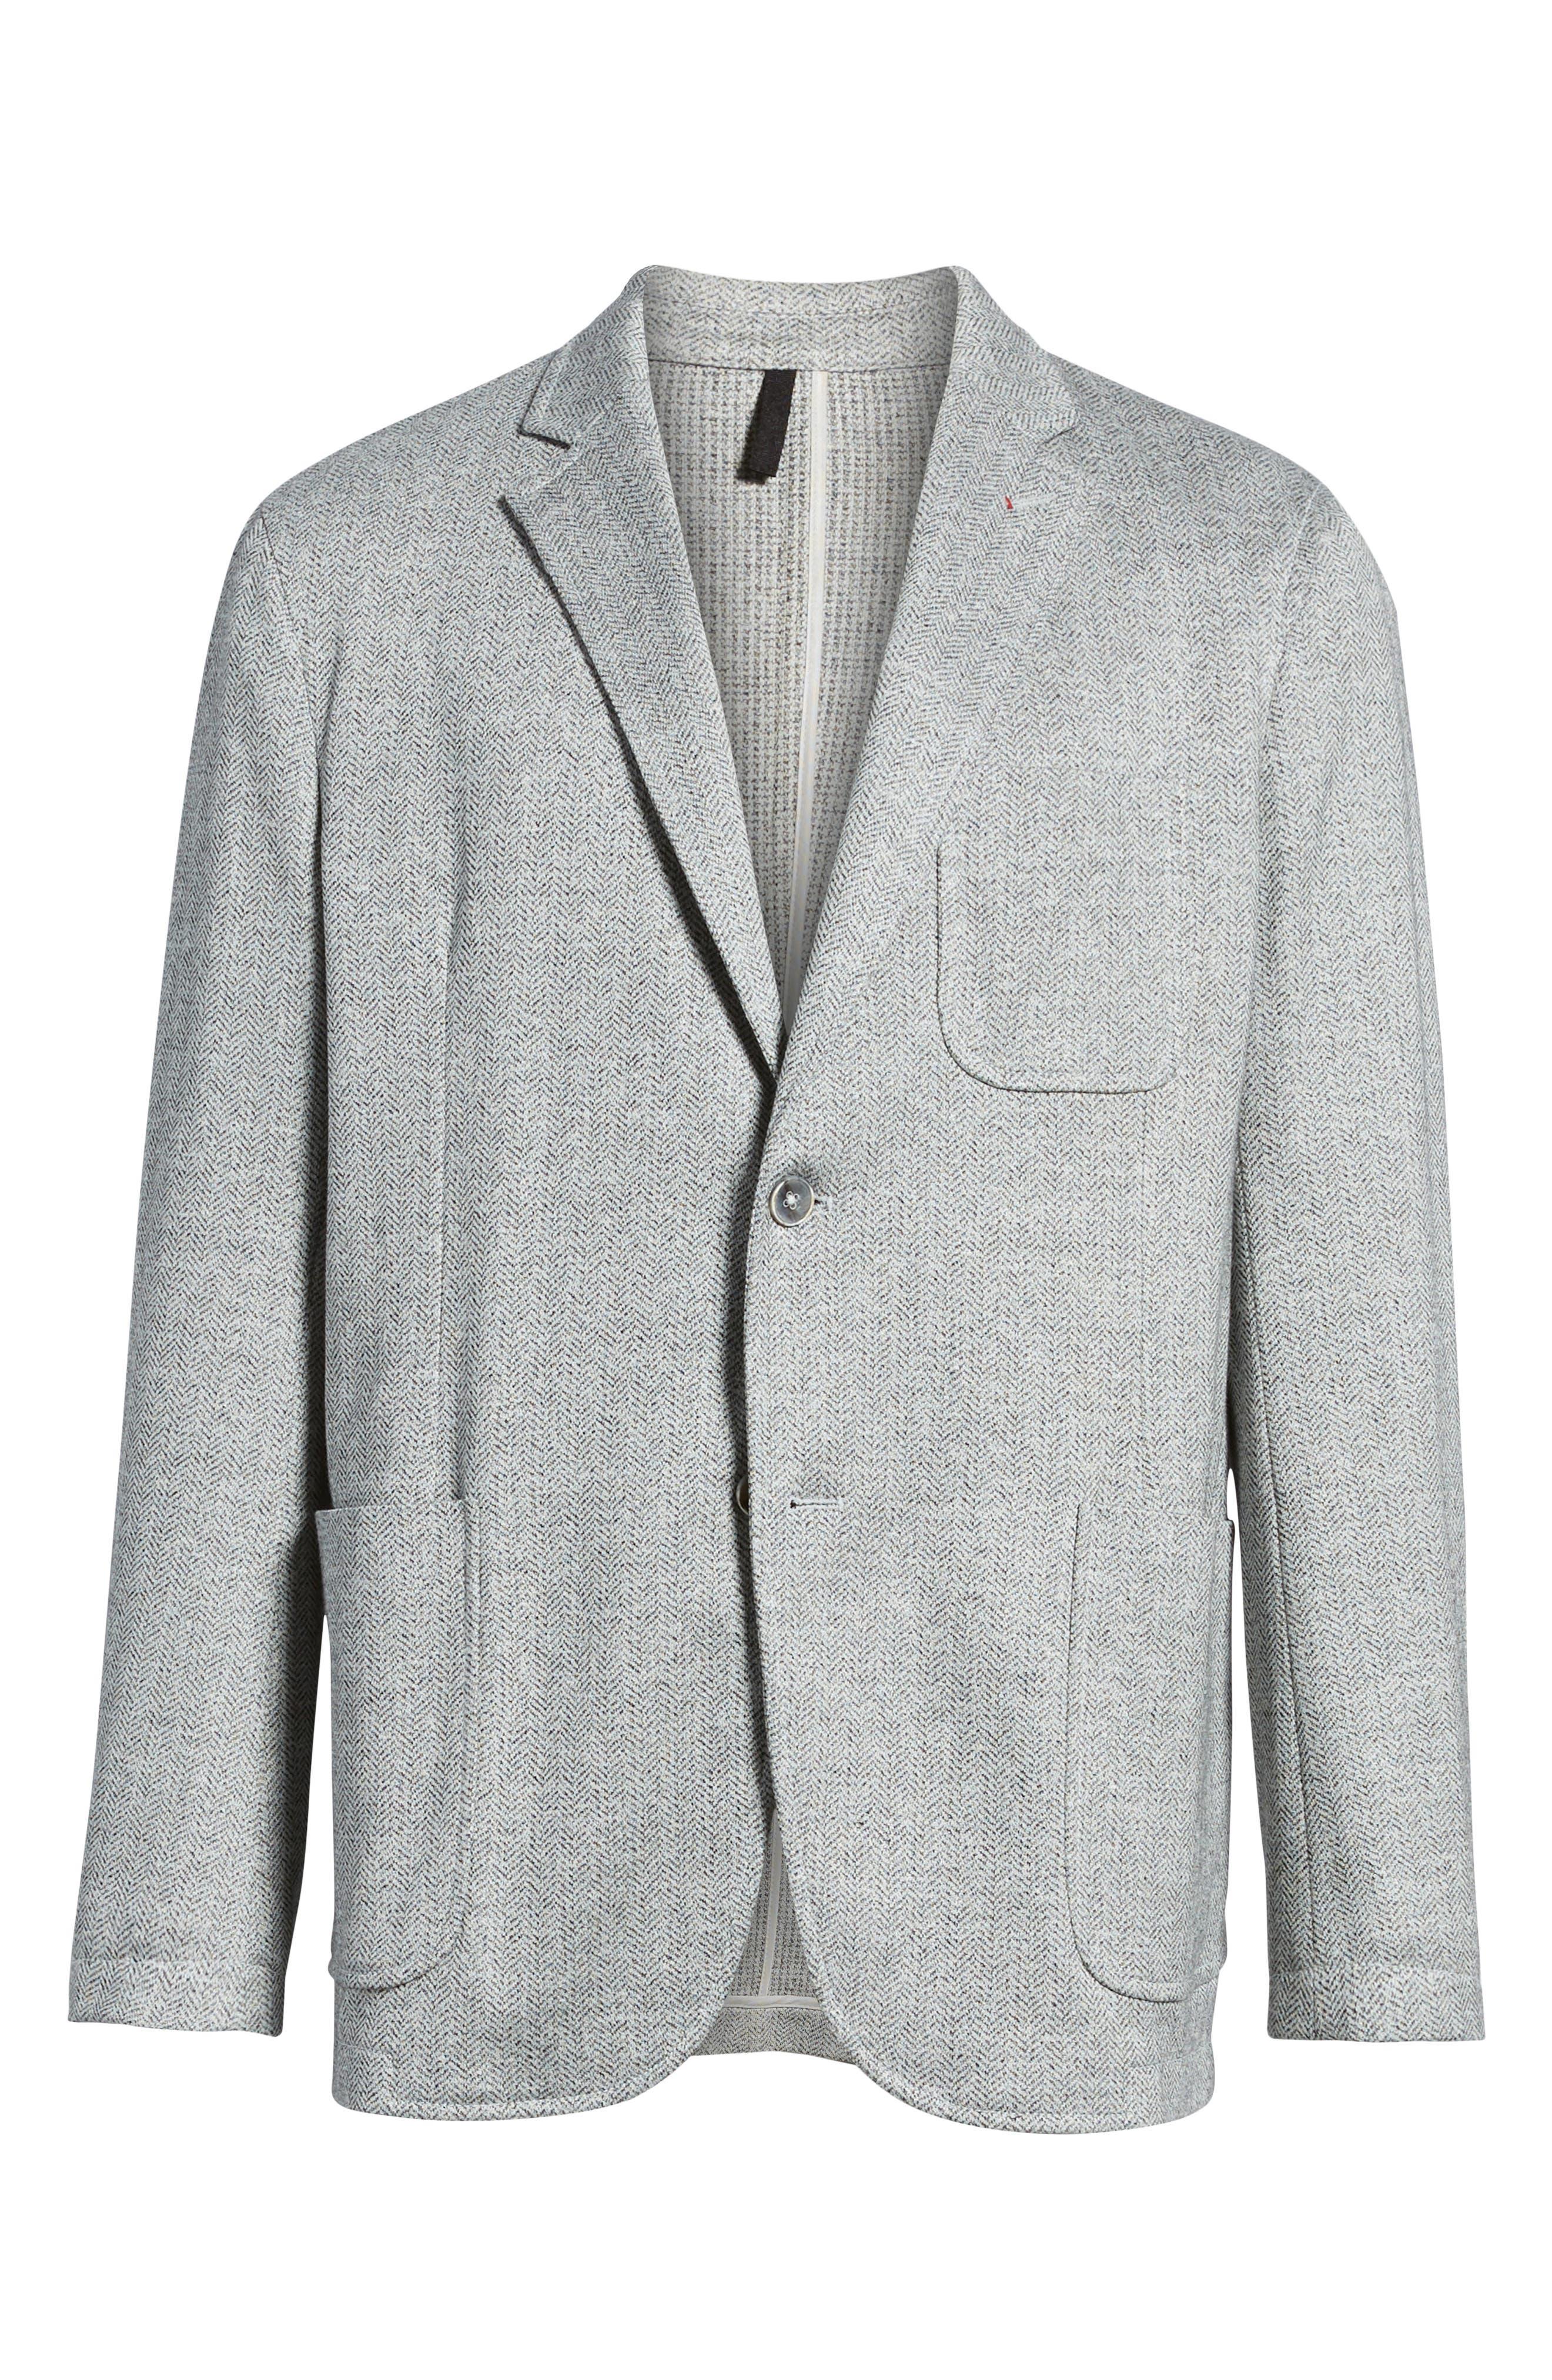 Regular Fit Herringbone Cotton & Linen Blazer,                             Alternate thumbnail 5, color,                             040